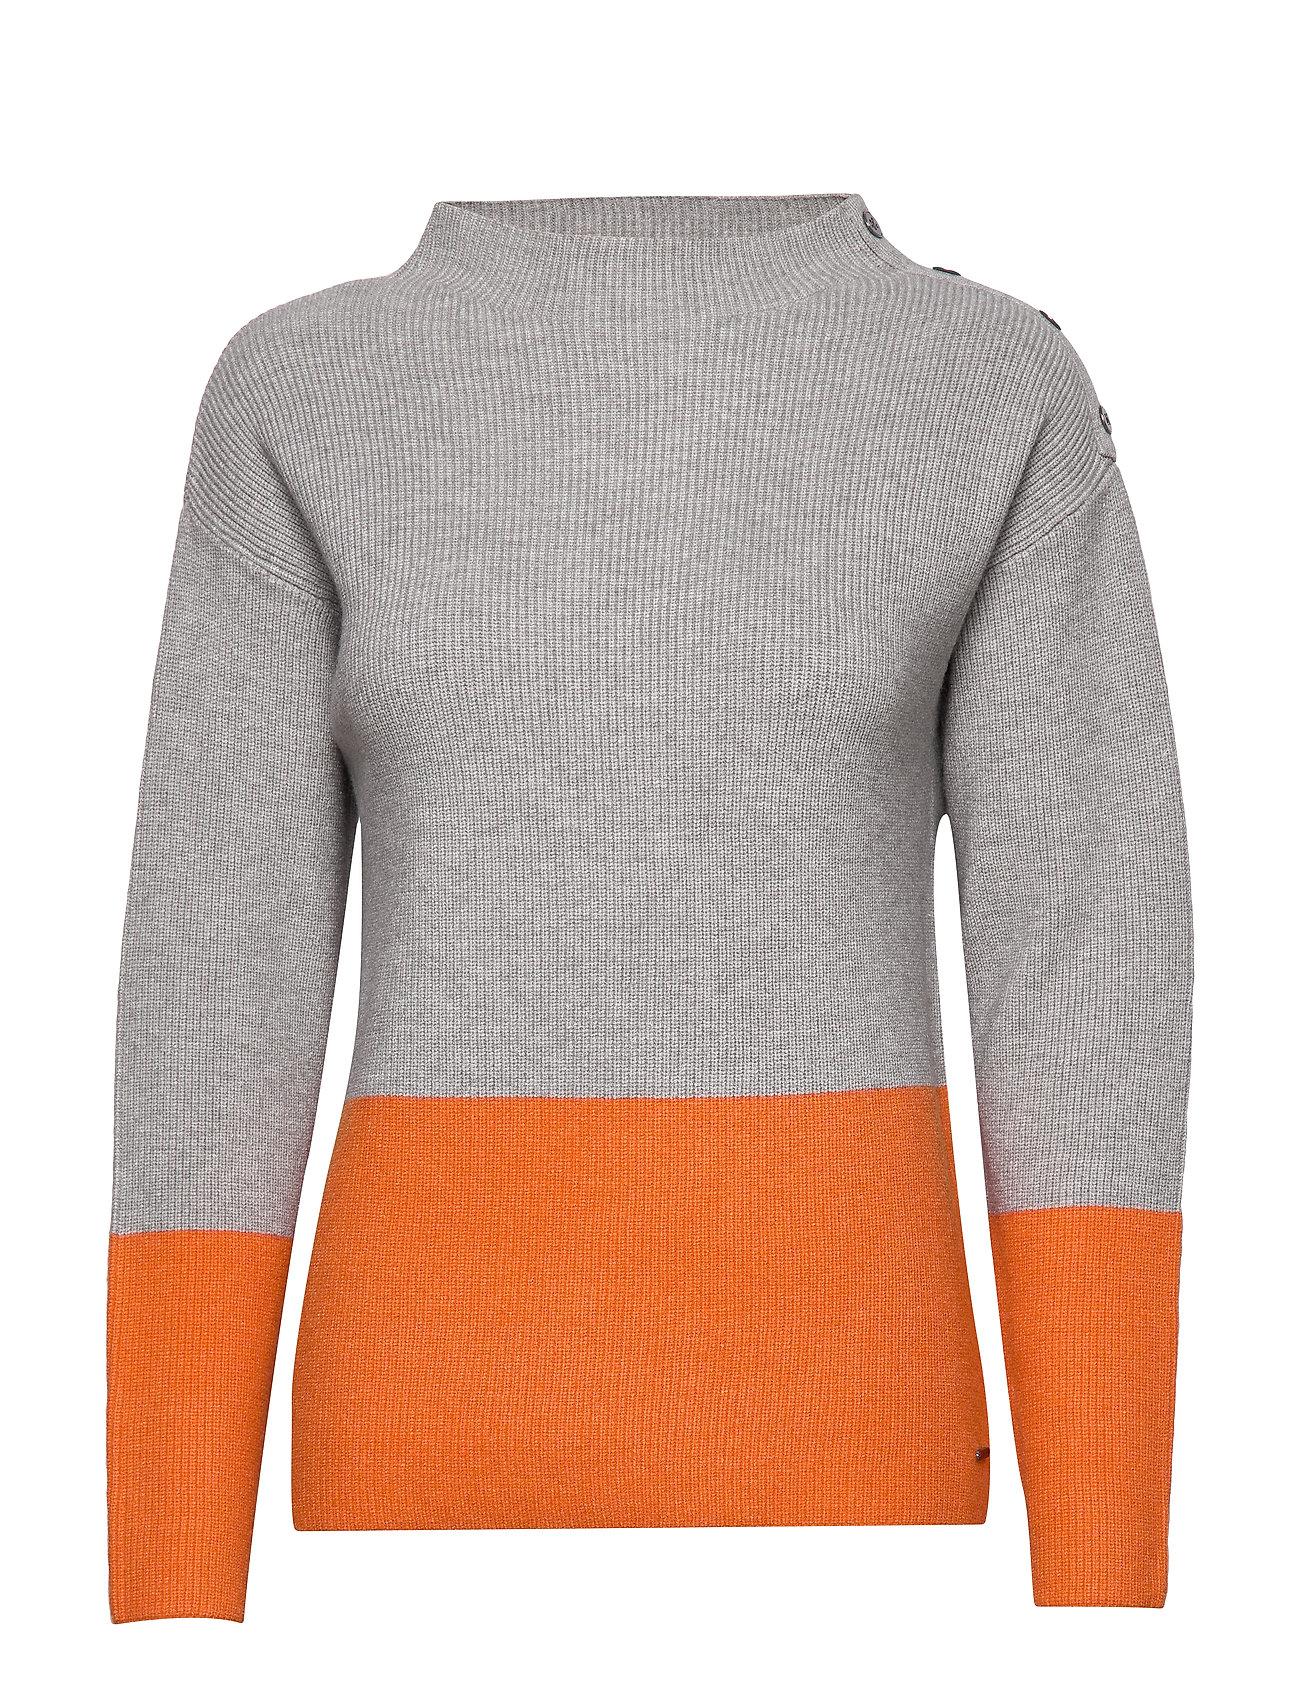 Brandtex Pullover-knit Heavy - VIBRANT